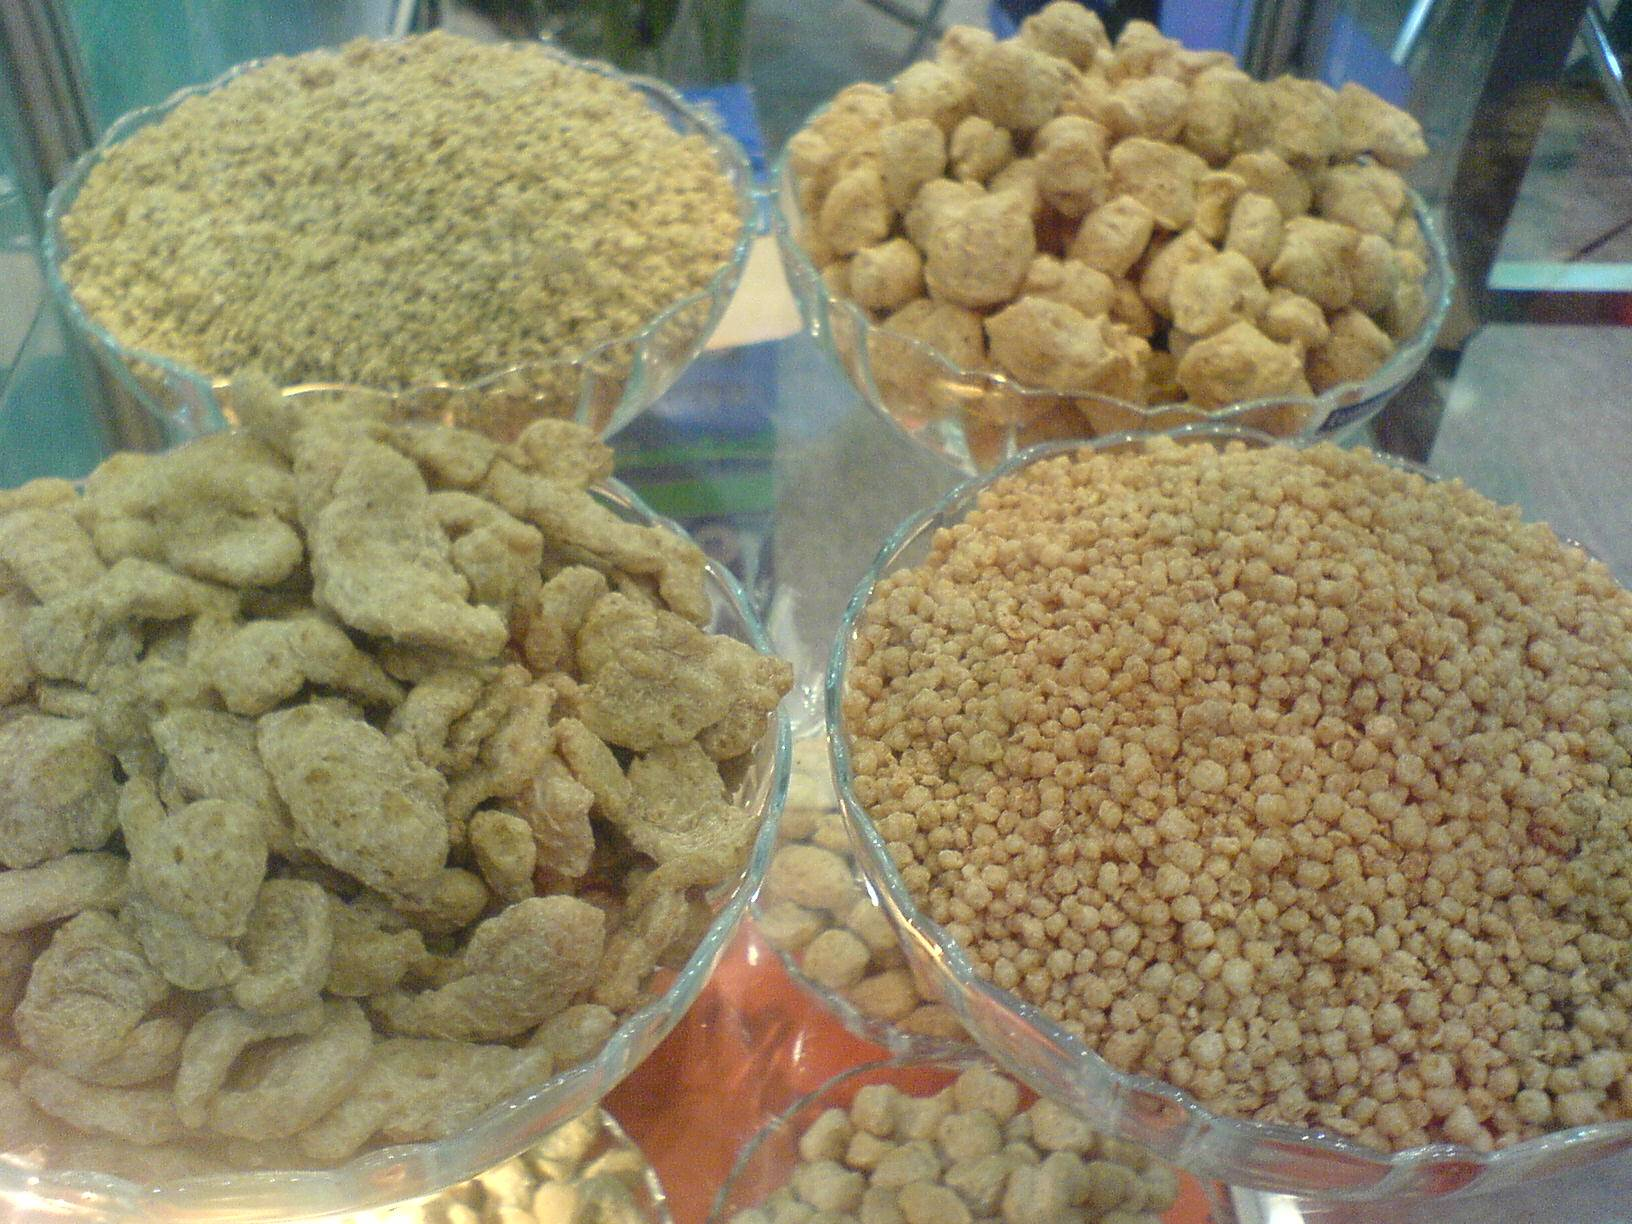 Textured Vegetable Protein